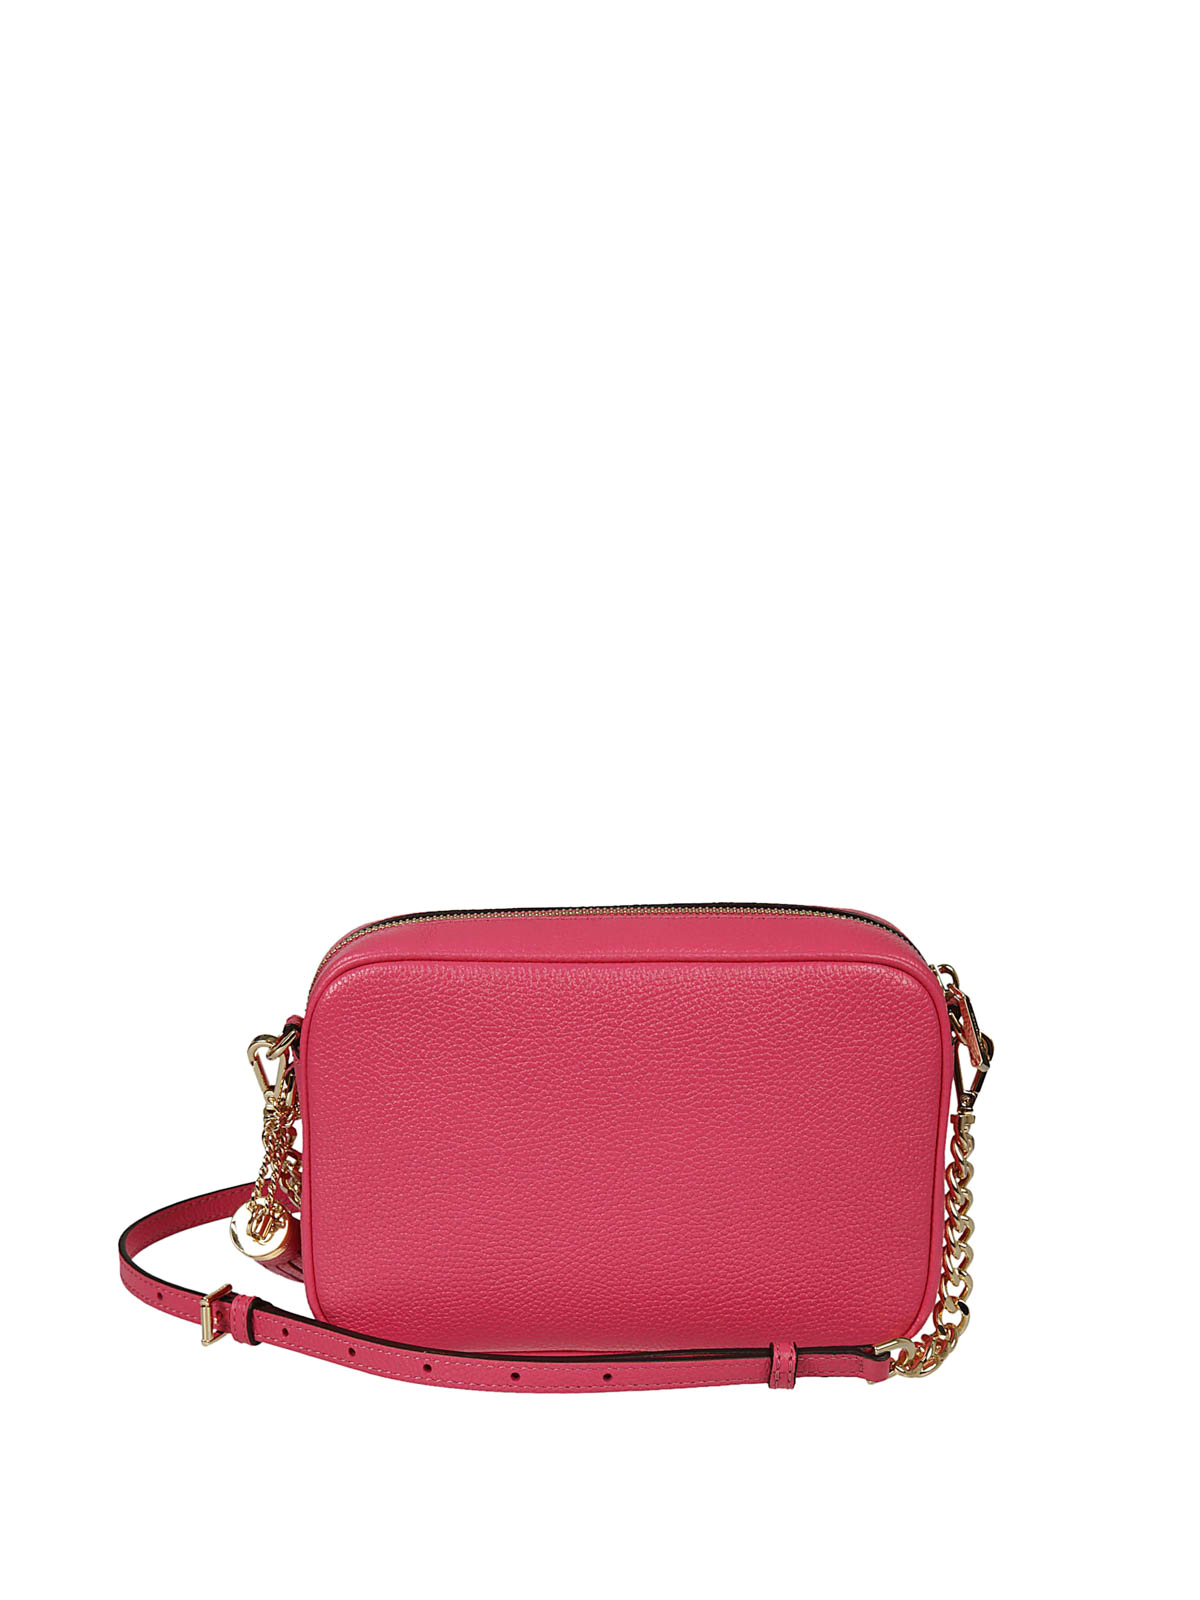 c2146e81b17e iKRIX MICHAEL KORS  cross body bags - Ginny pebble leather medium camera bag